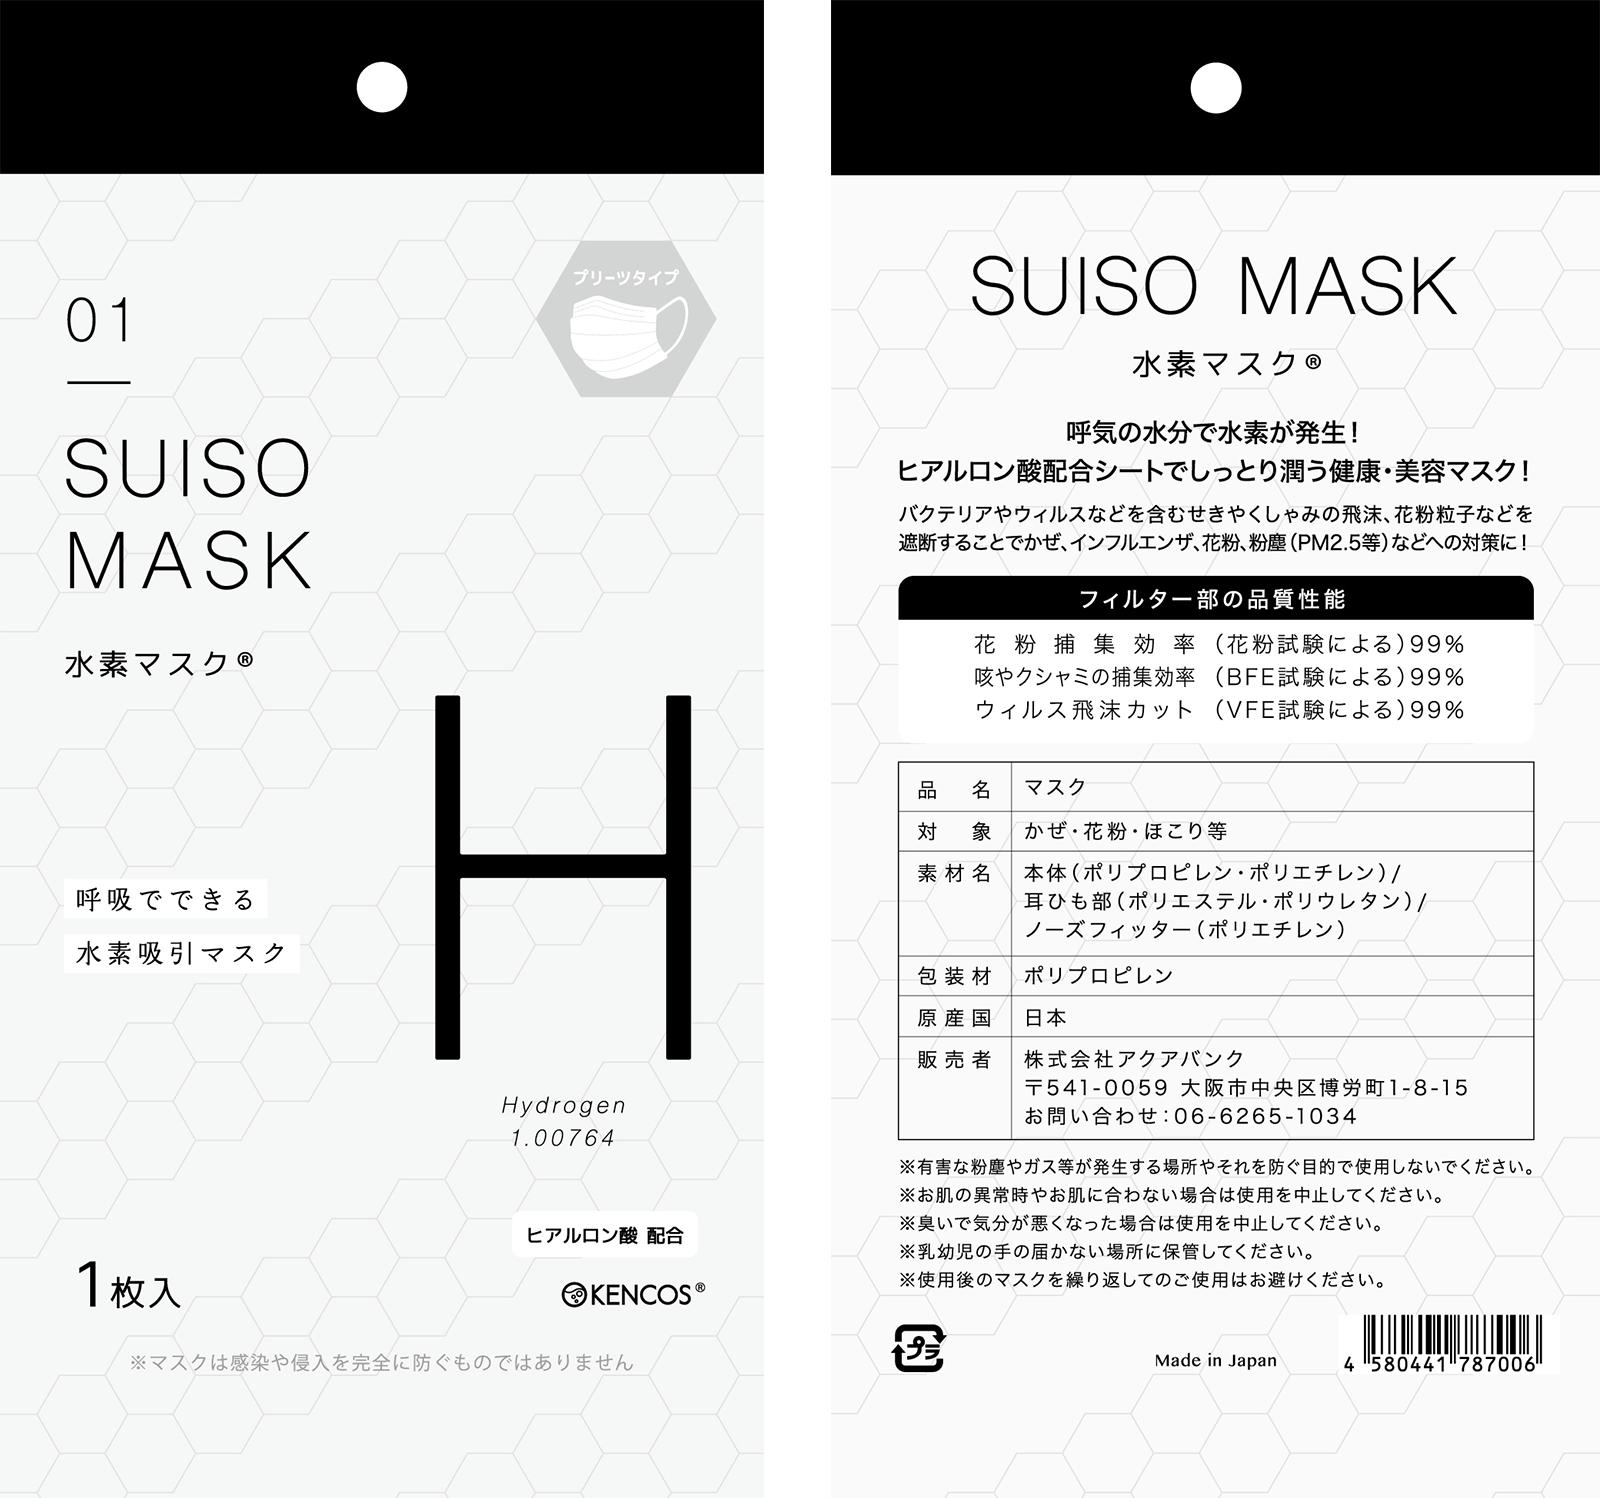 SUISO MASK 水素マスクパッケージ